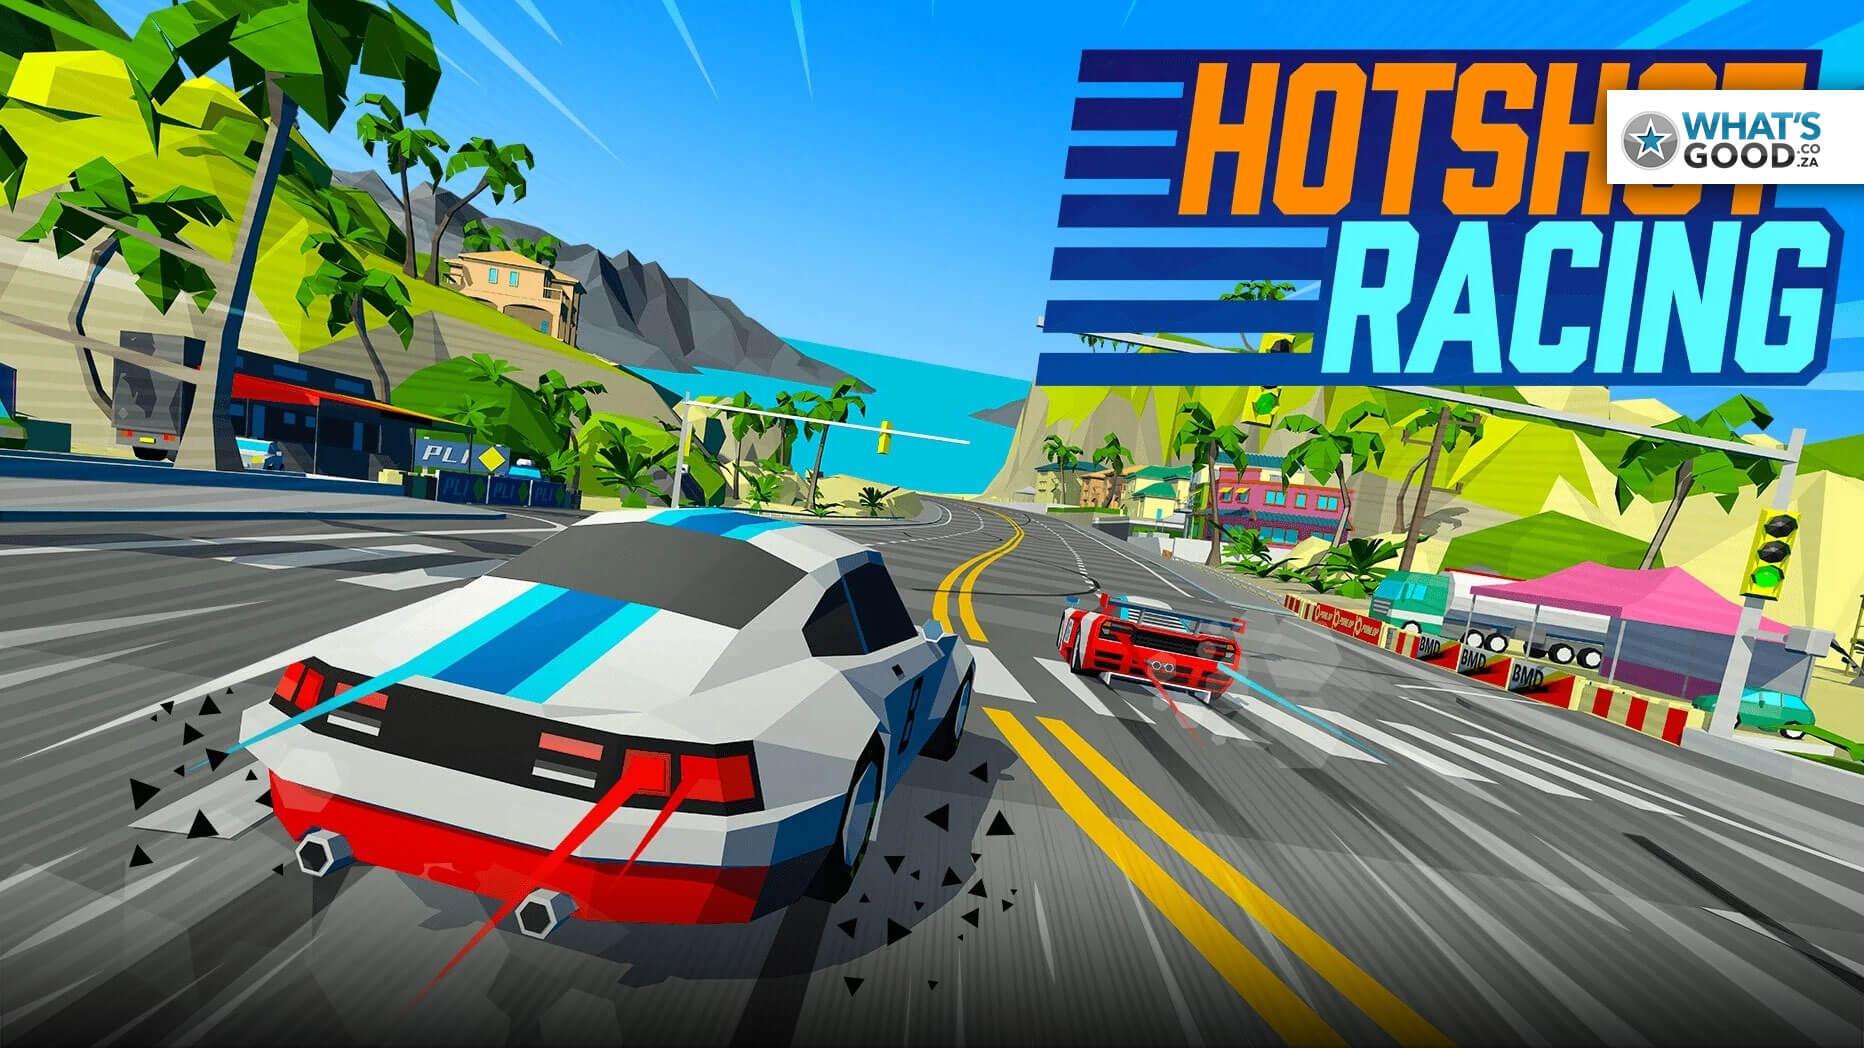 HotshotsRacing